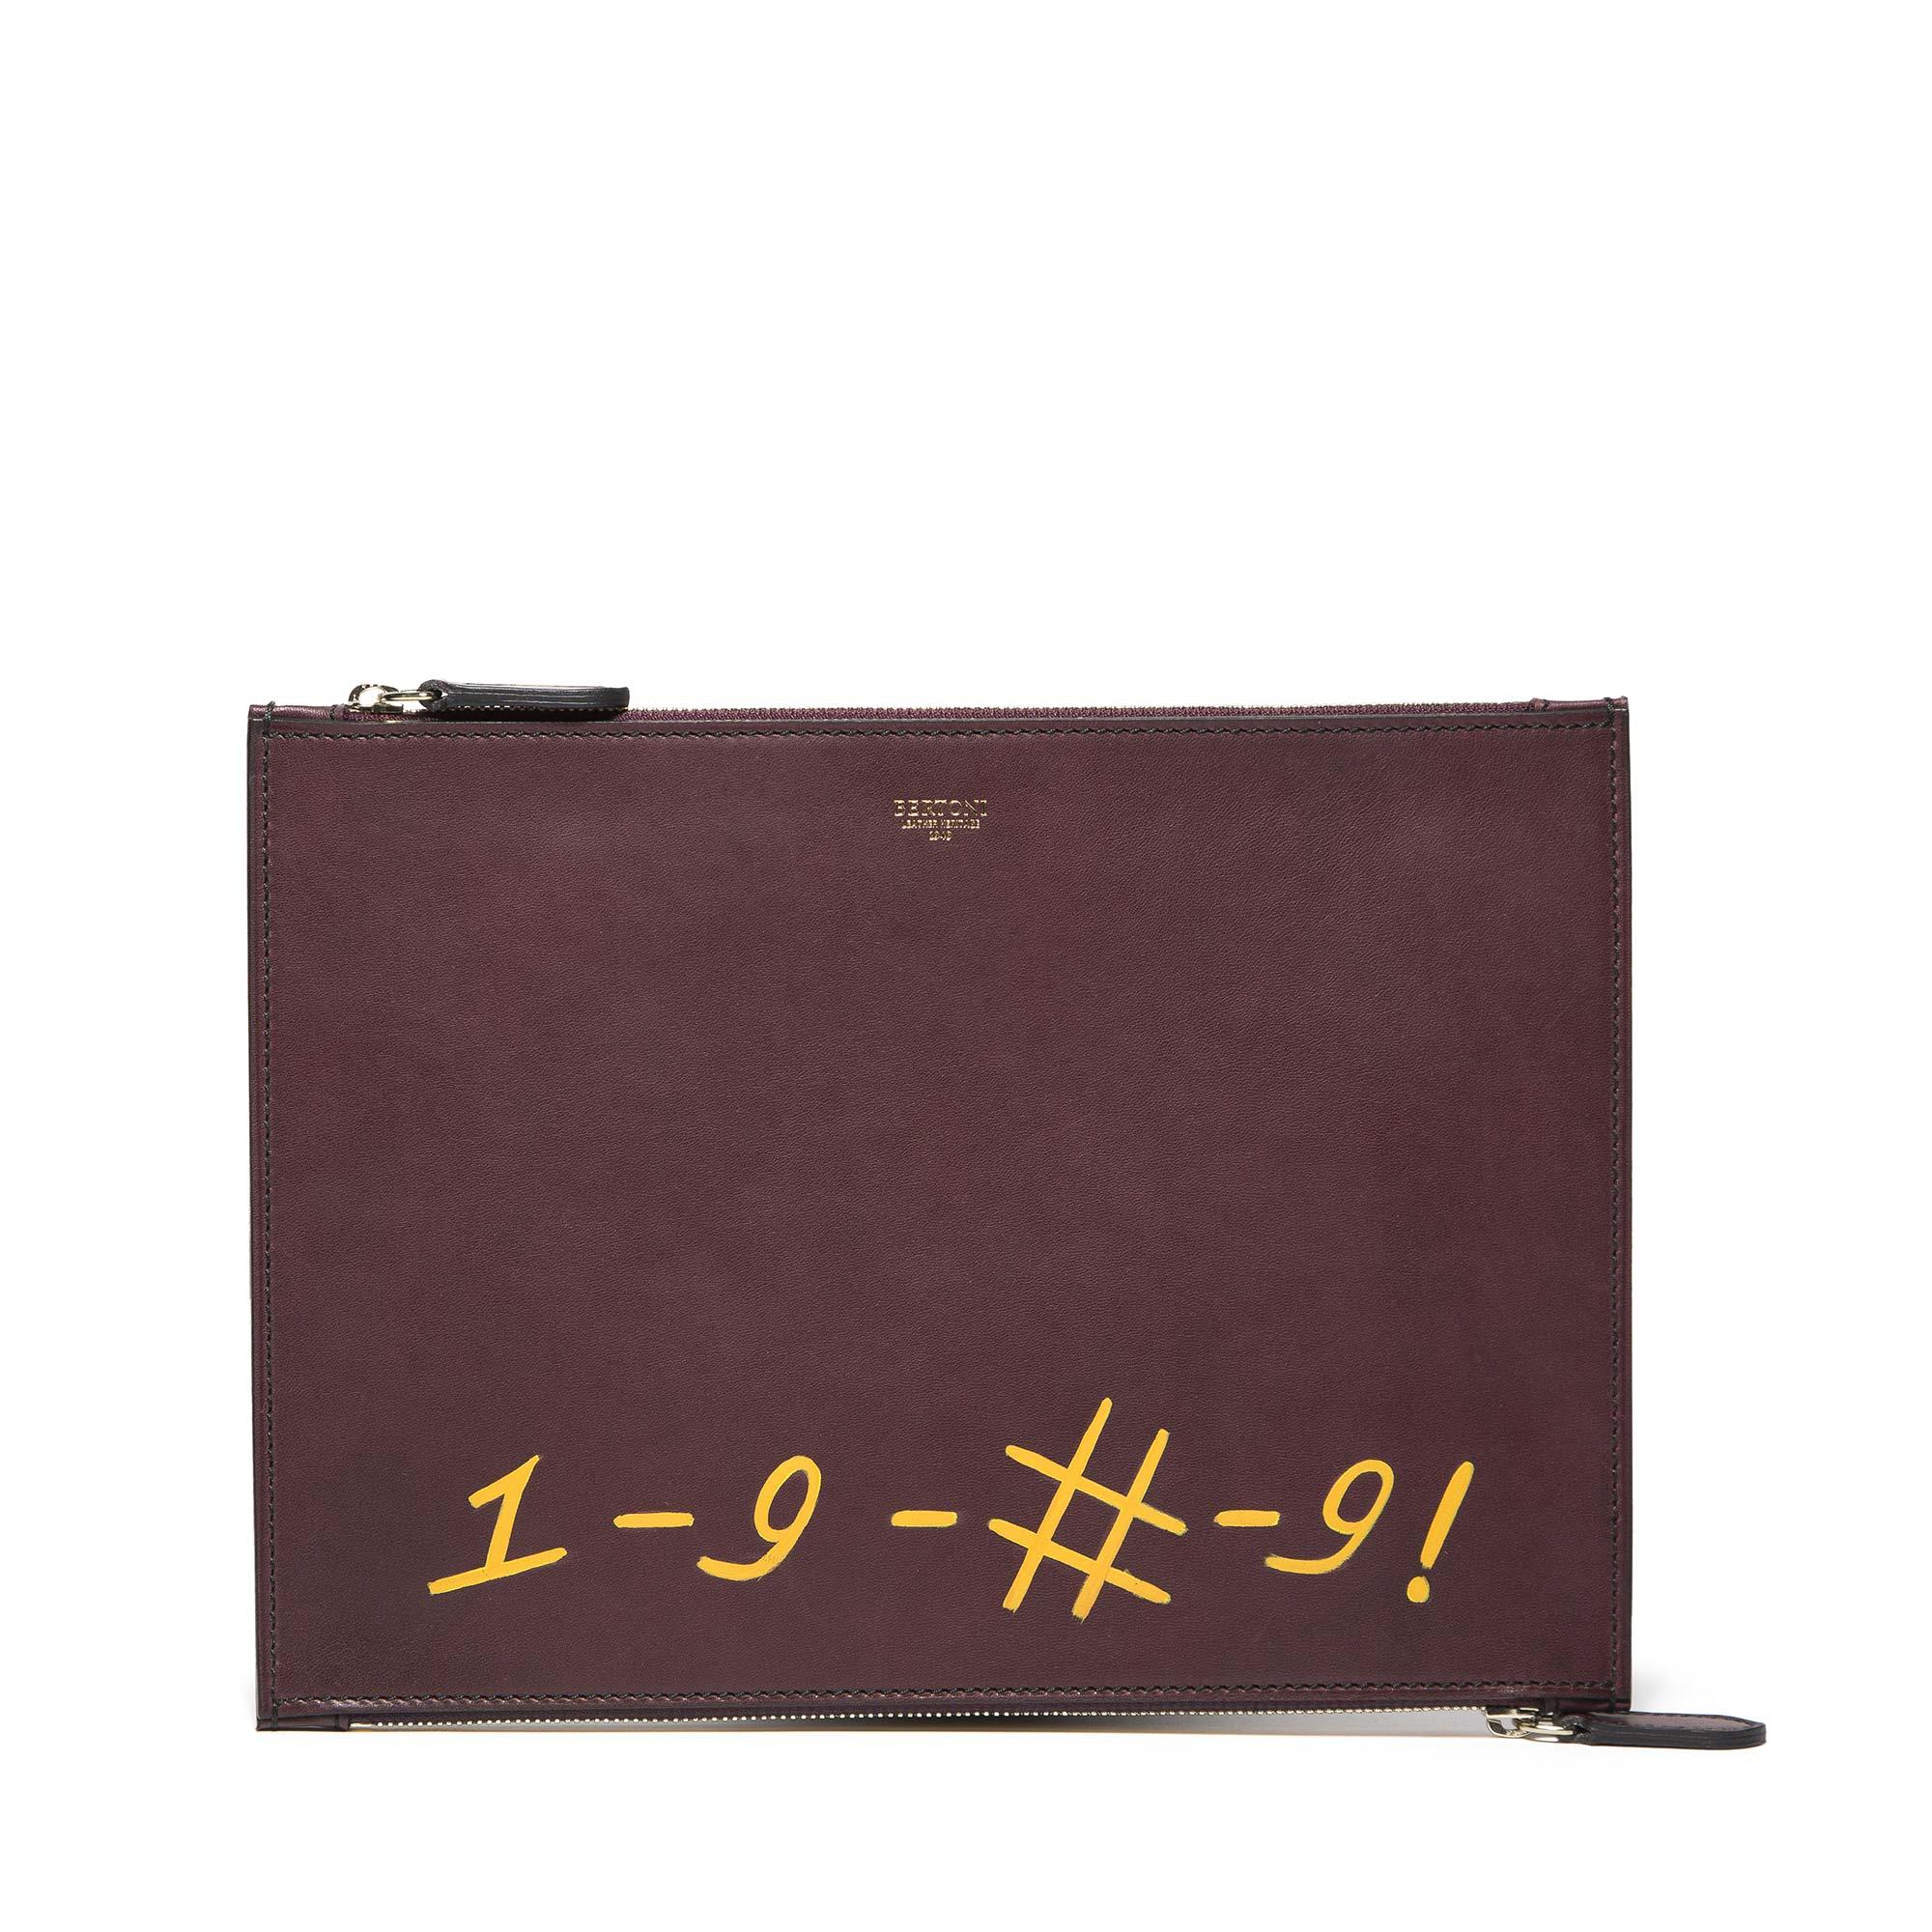 Double-Zipped-Pouch-dark-brown-french-calf-bag-Bertoni-1949